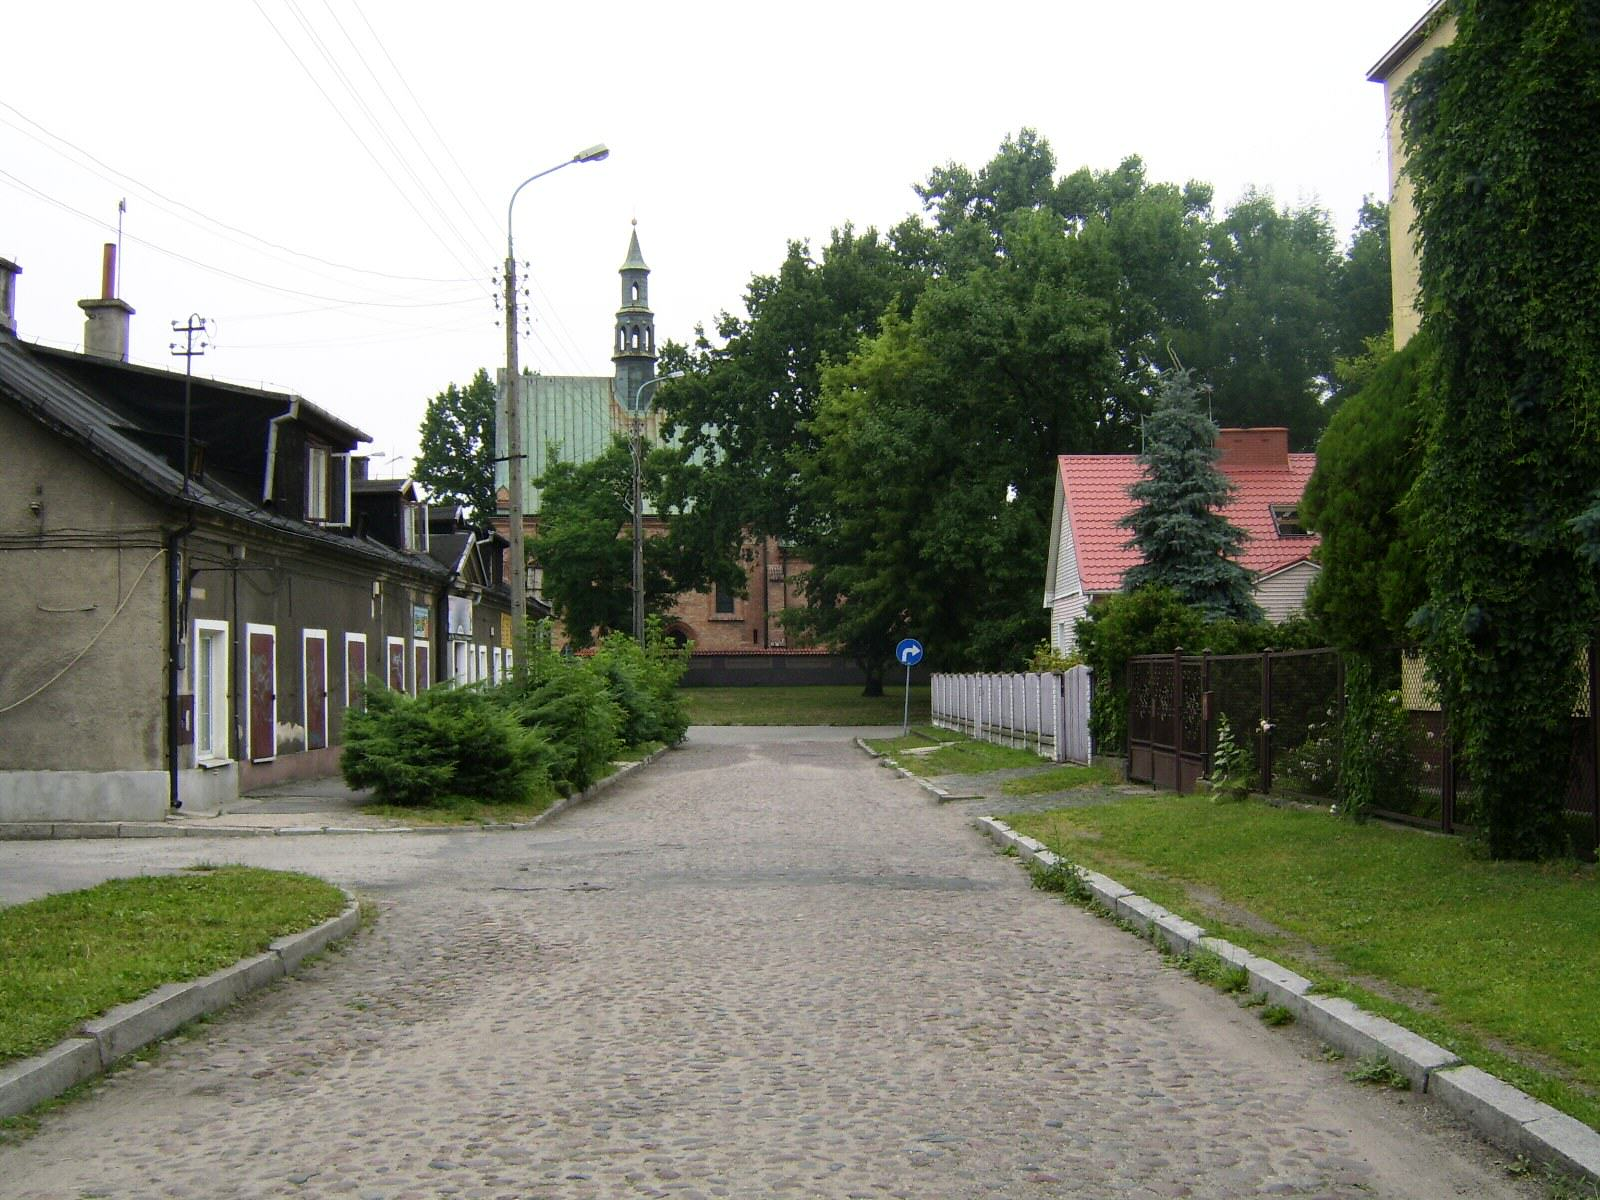 Stare Miasto w Radomiu. autor: Farary / Wikimedia Commons